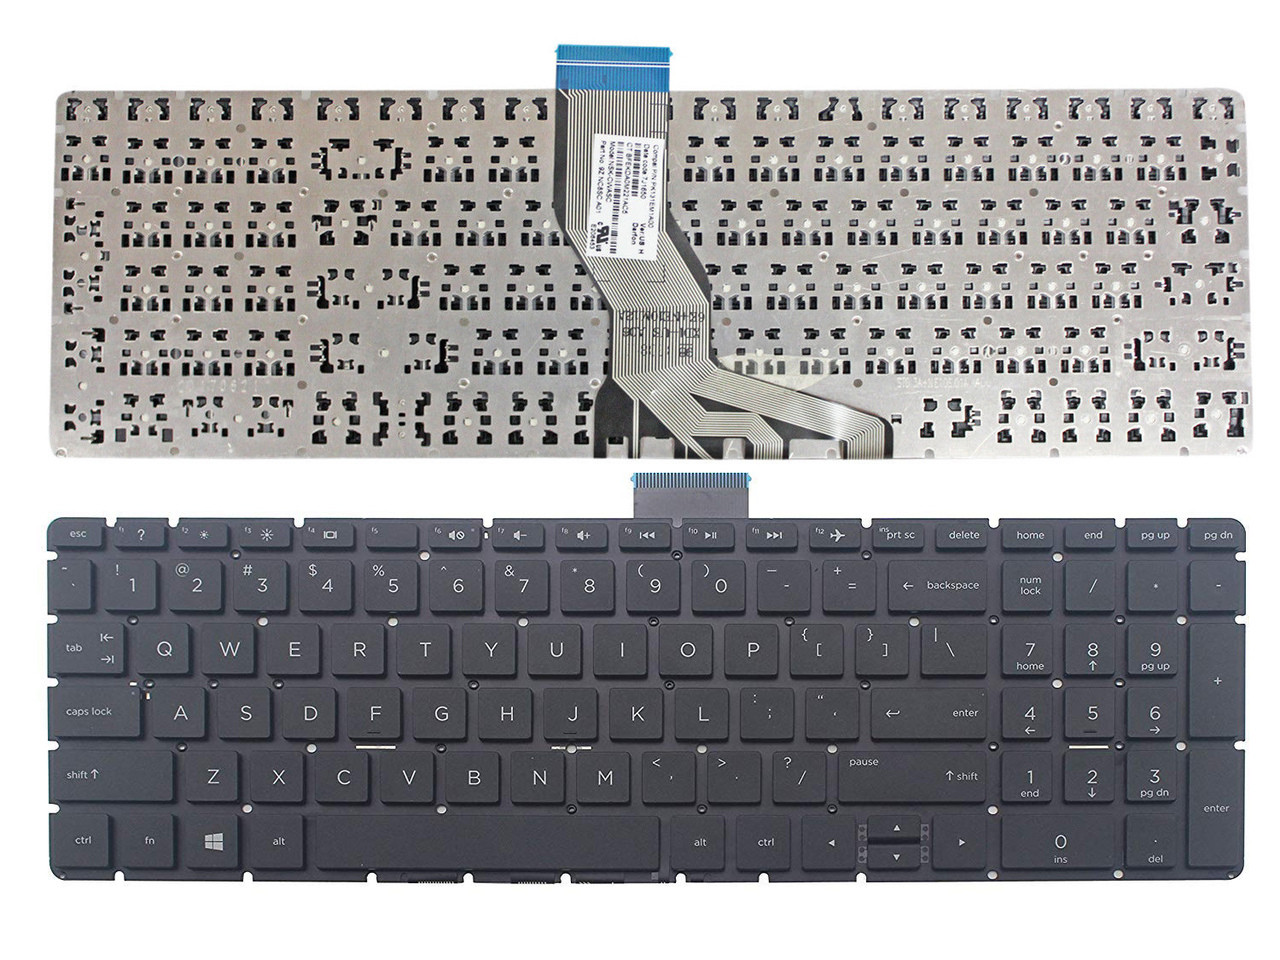 for HP 15-BS178CL 15-BS188CL 15-BS028CL 15-bs000 15-bs100 15-bs500 15-bs600 15-BS010NR 15-BS012CA 15-BS016DX 15-BS062ST Looleking US Black English Laptop Keyboard Without Frame